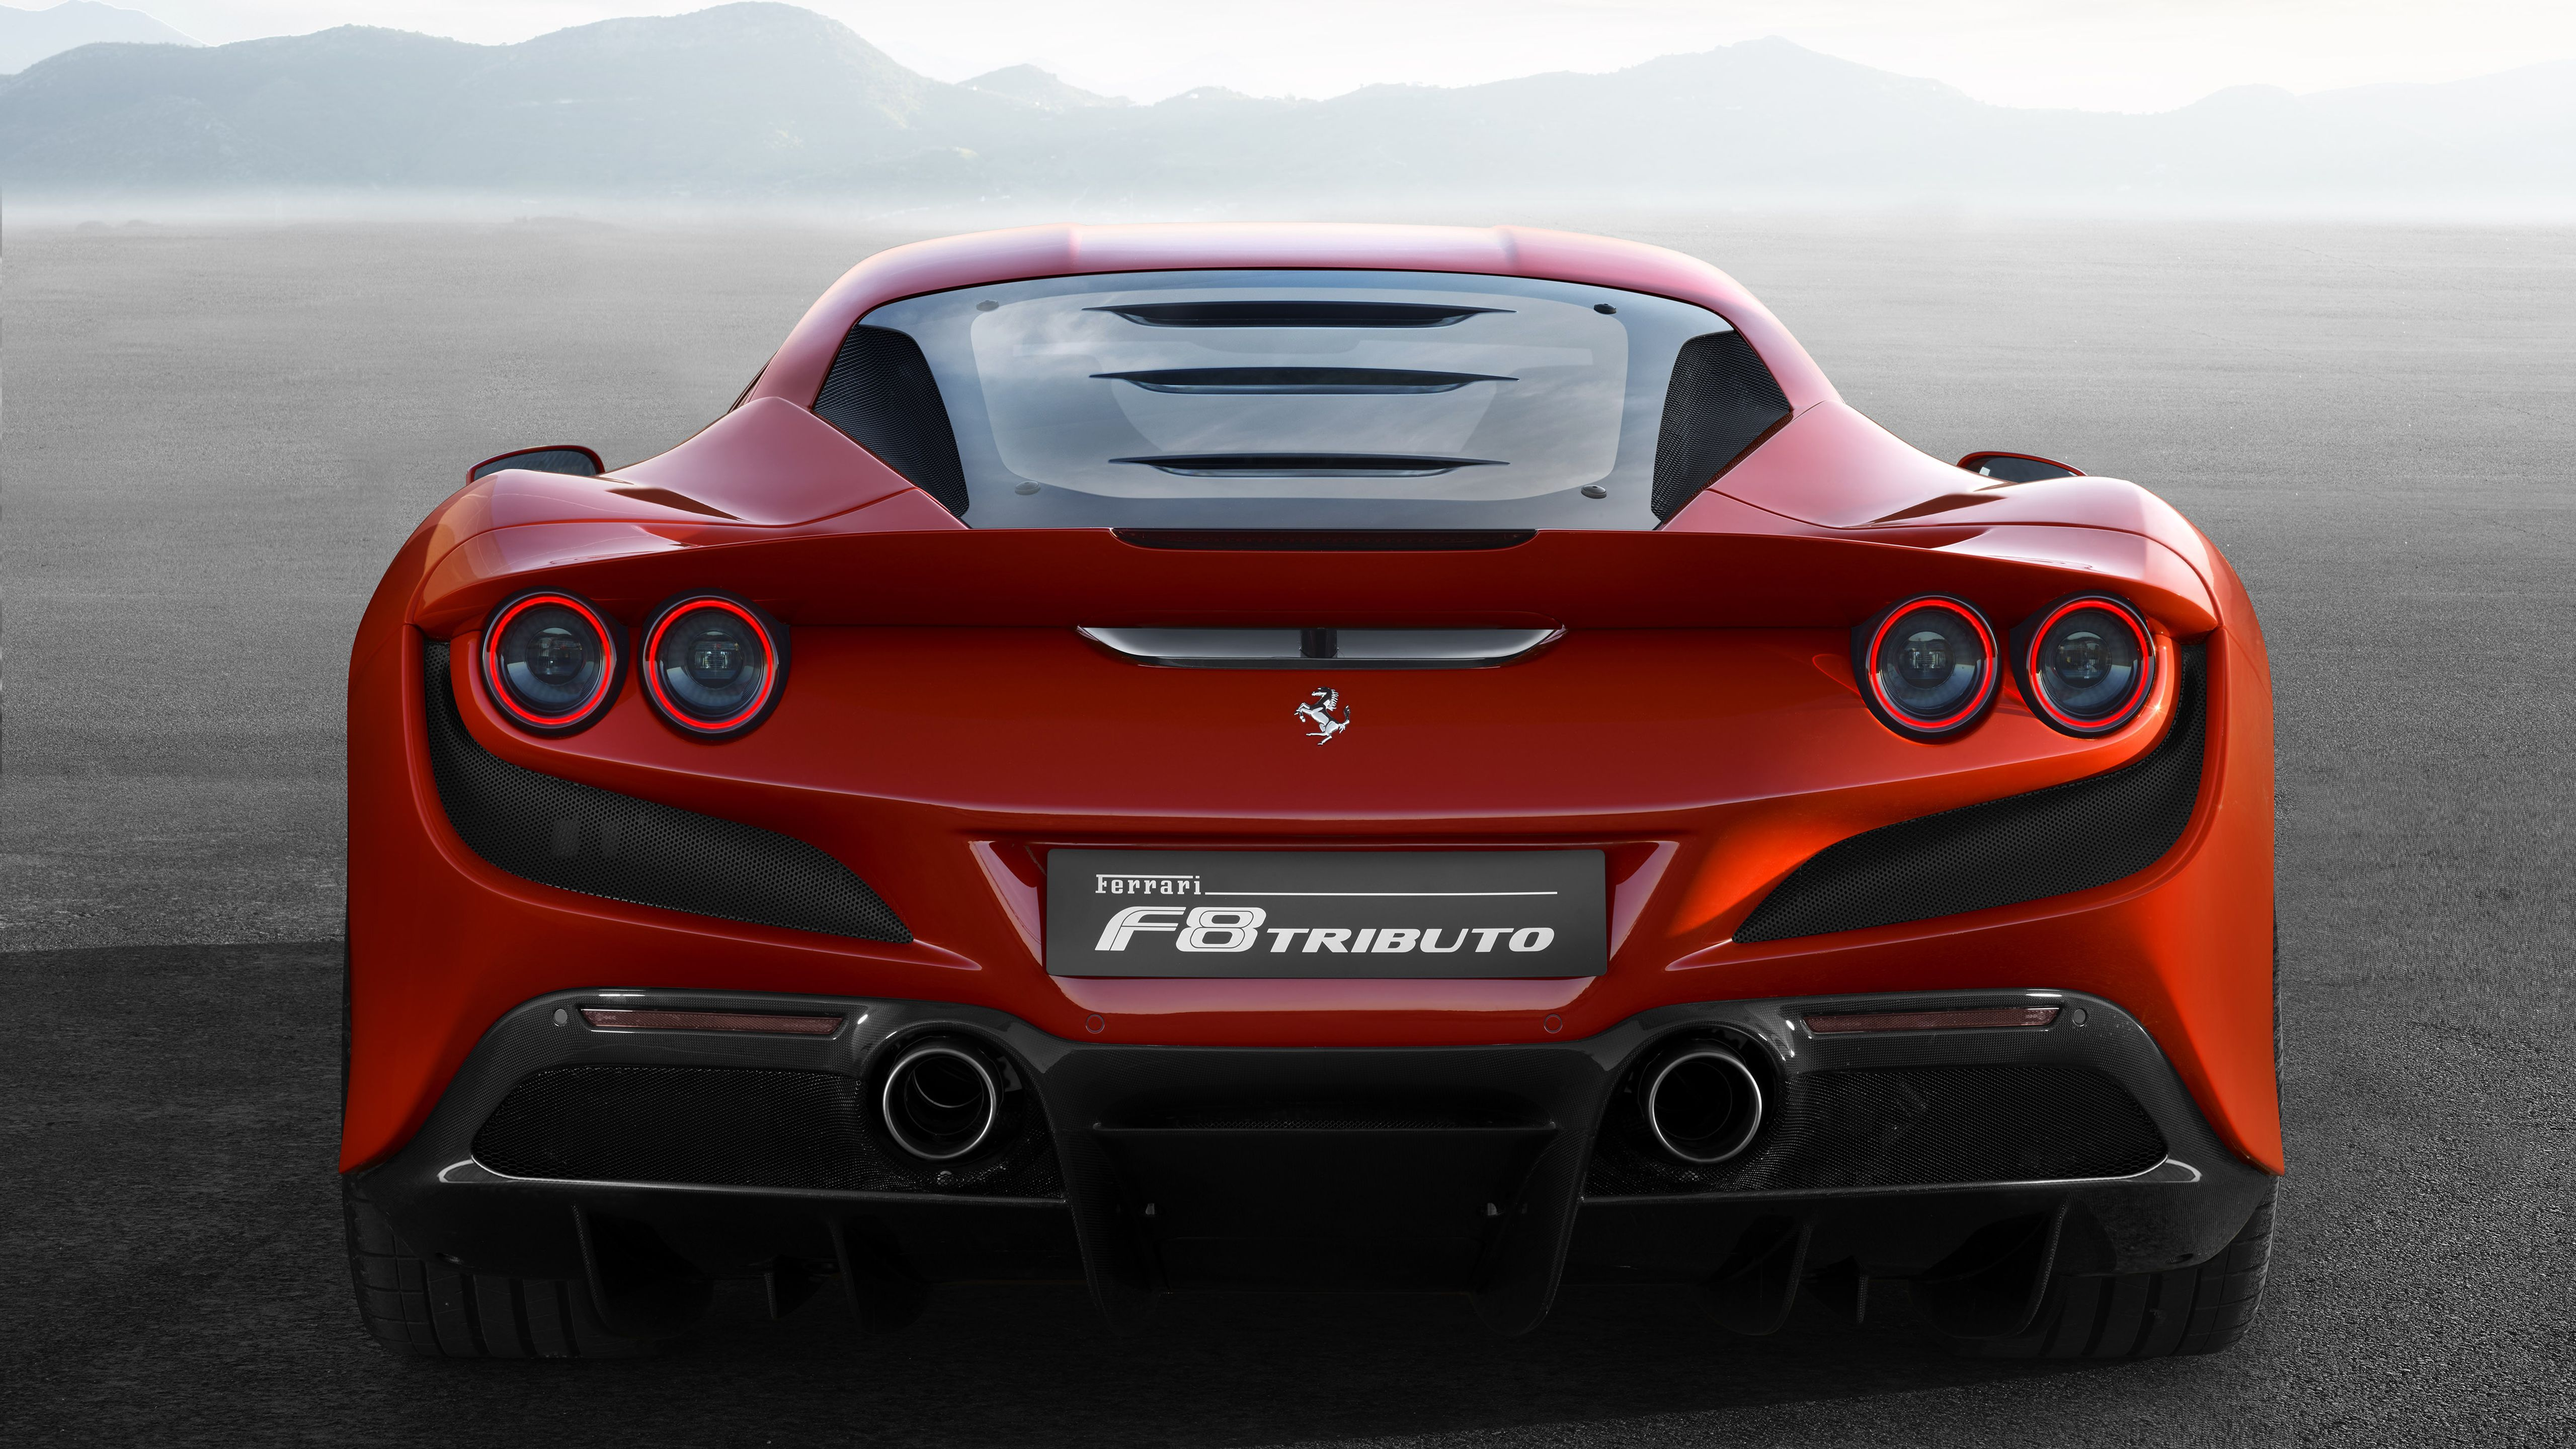 Ferrari 2019 Wallpapers Top Free Ferrari 2019 Backgrounds Wallpaperaccess